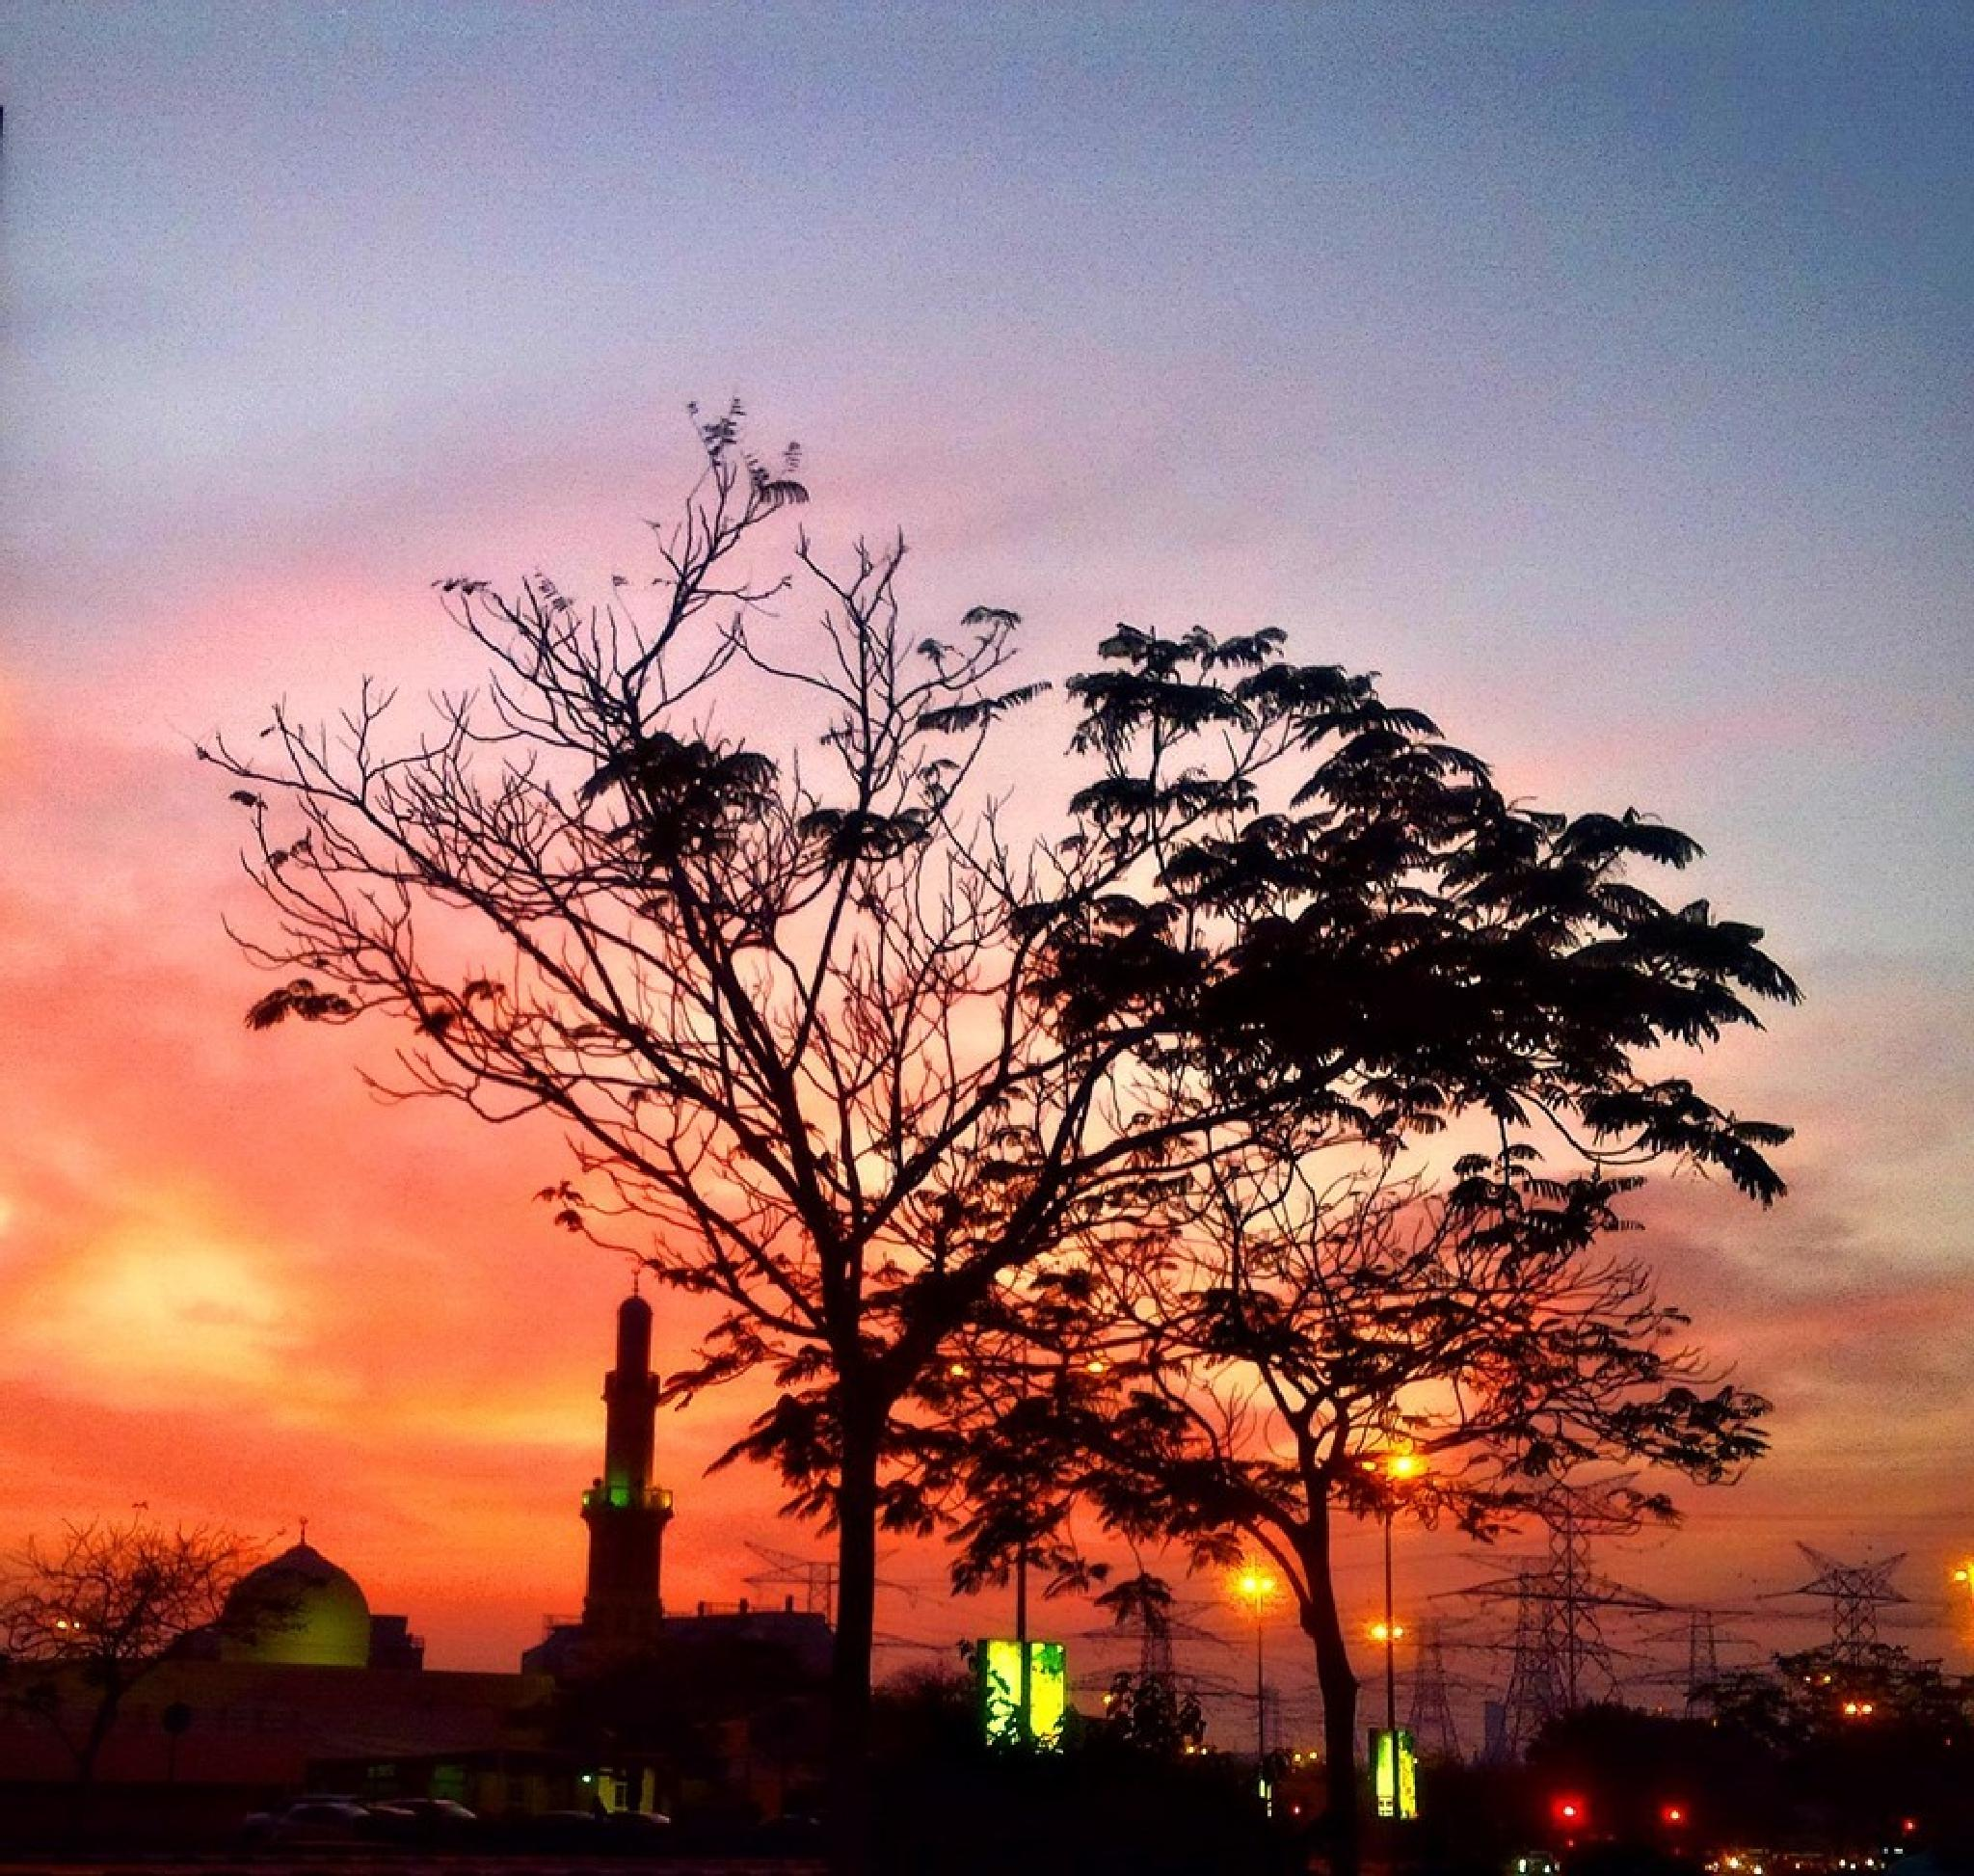 Sunset   by Mamata Mohapatra